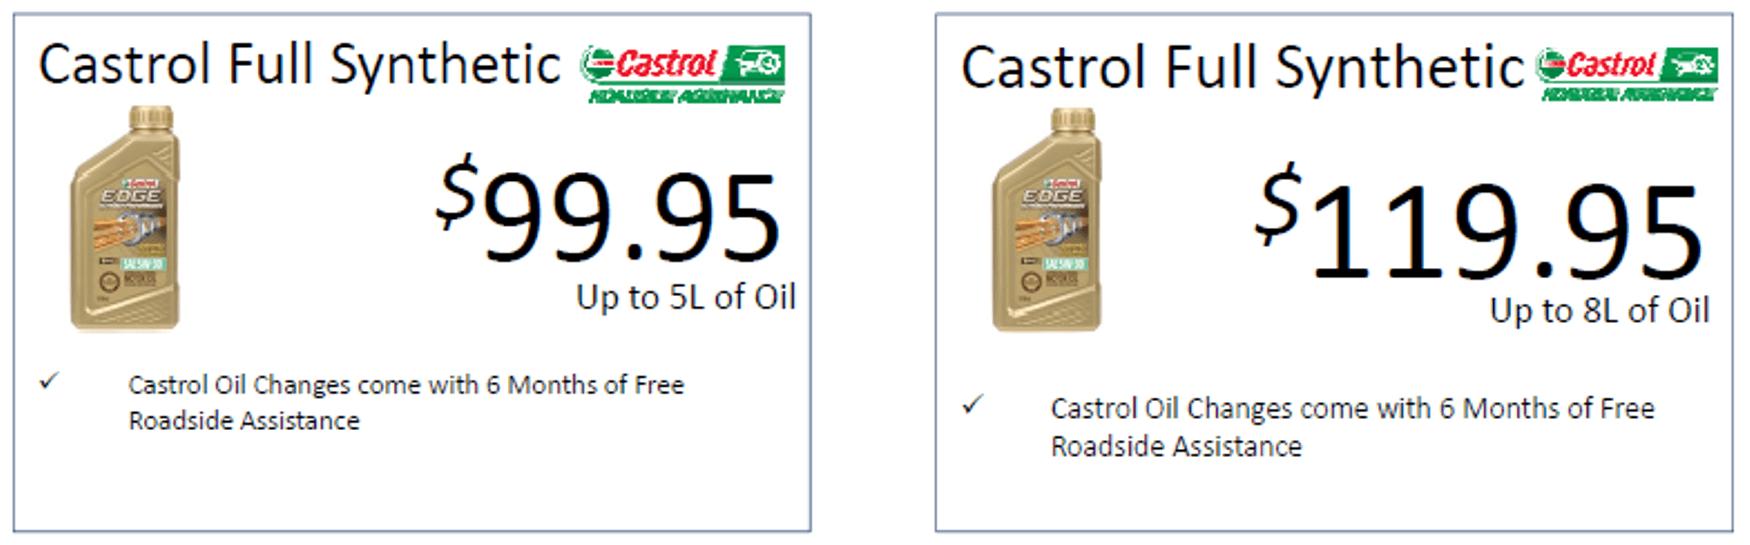 Castrol full synthetic